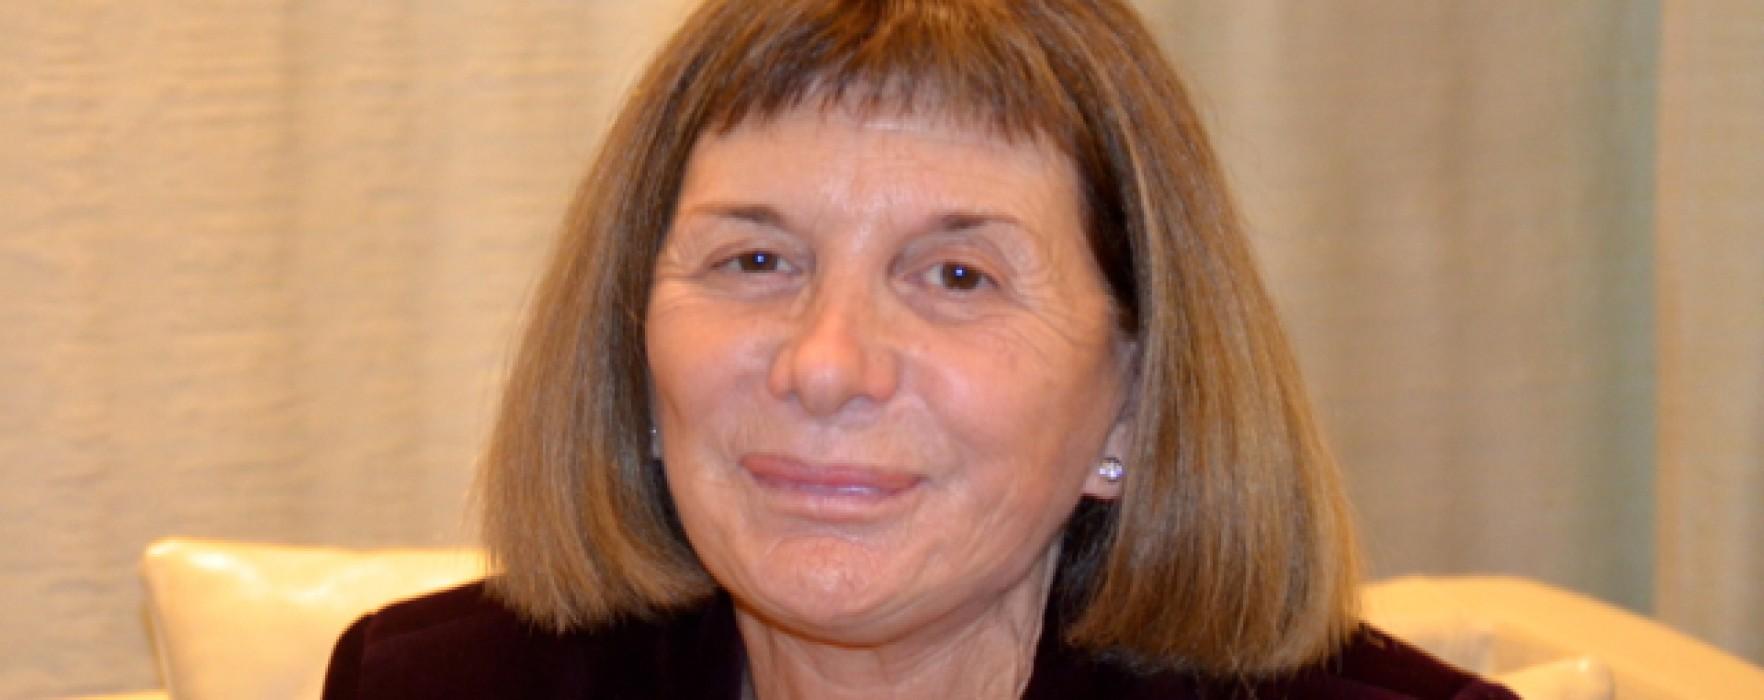 Alicia Giménez-Bartlett, la giallista più amata dagli italiani